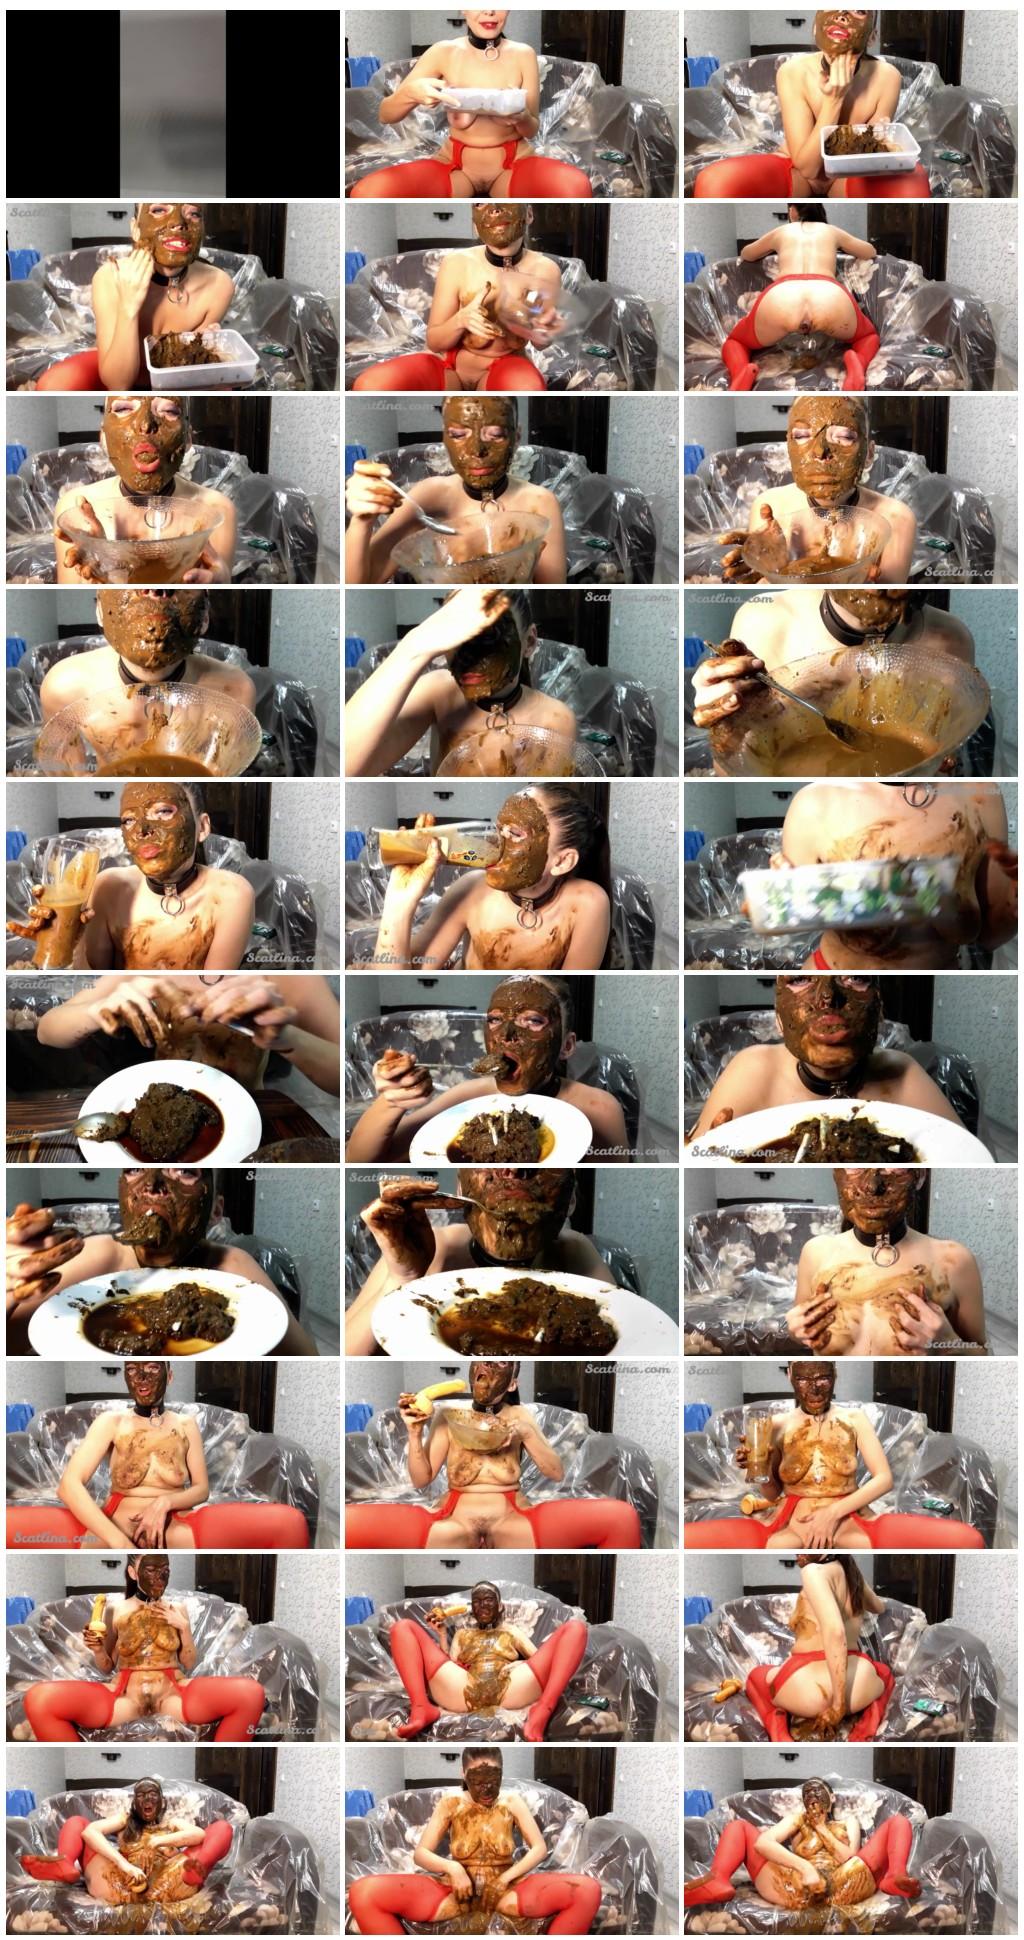 ScatLina Shitty Milk 1 and 2 Scat solo shit defecation Big ShitShitty Ass Masturbation Smearingshit eatingDildospiss drinking Diarrhea thumb - ScatLina - Shitty Milk 1 and 2 [Scat solo, shit, defecation,  Big Shit,Shitty Ass, Masturbation, Smearing,shit eating,Dildos,piss drinking, Diarrhea]